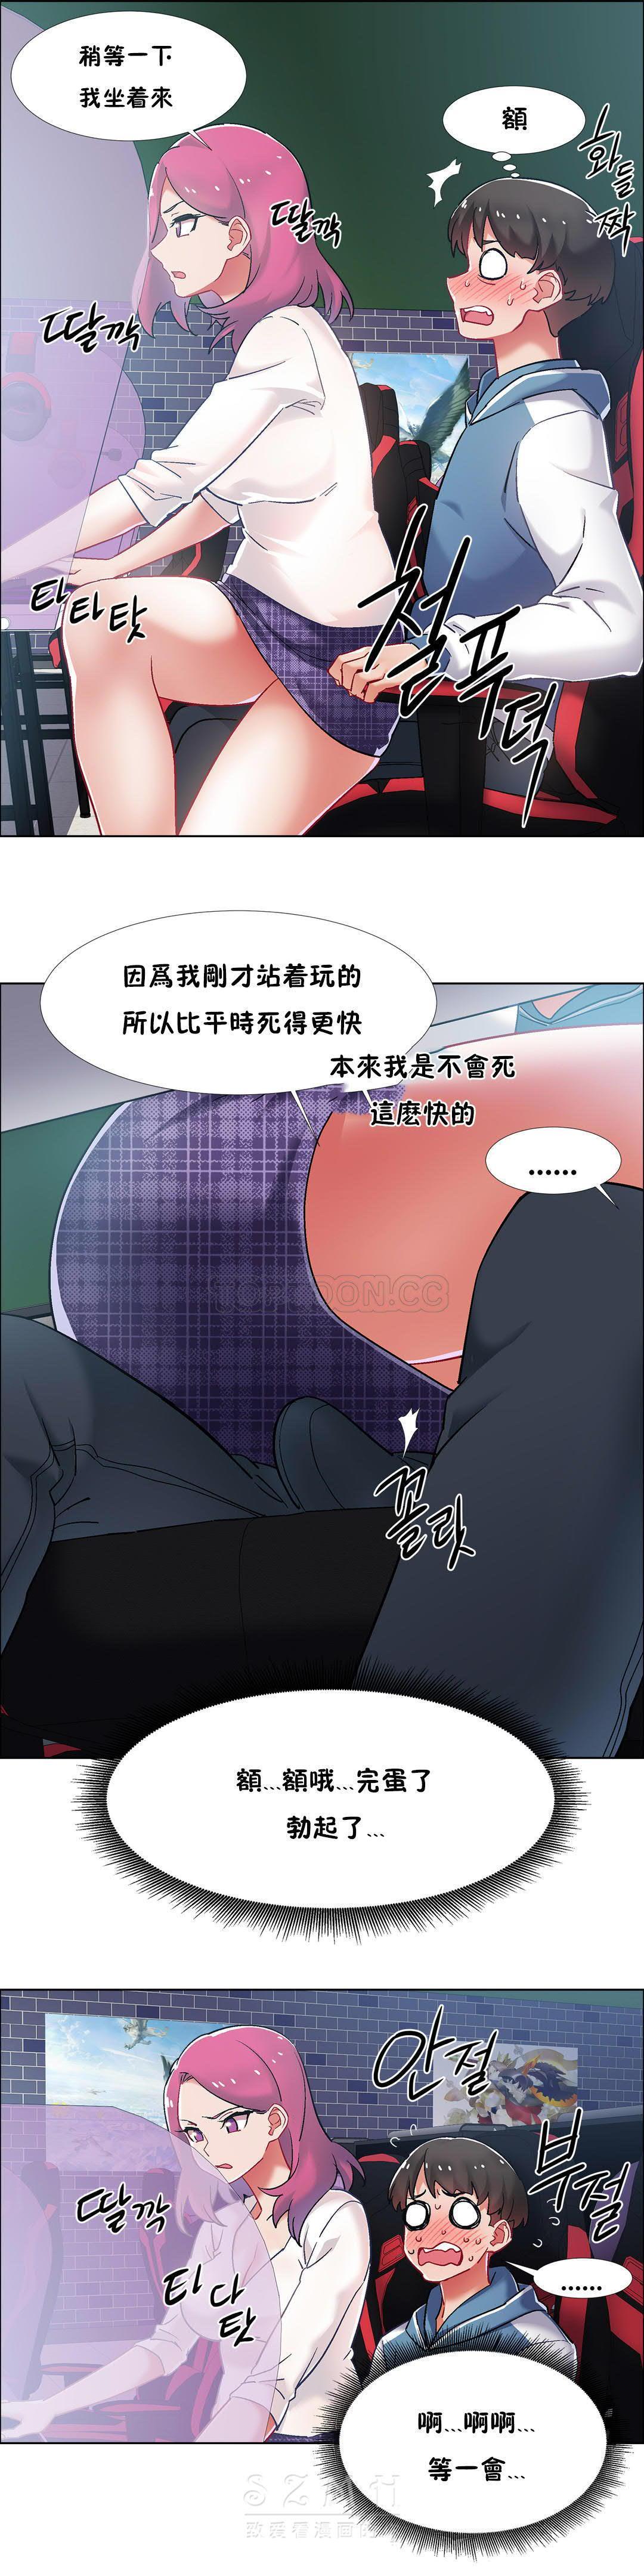 [Studio Wannabe] Rental Girls | 出租女郎 Ch. 33-58 [Chinese]  第二季 完结 23